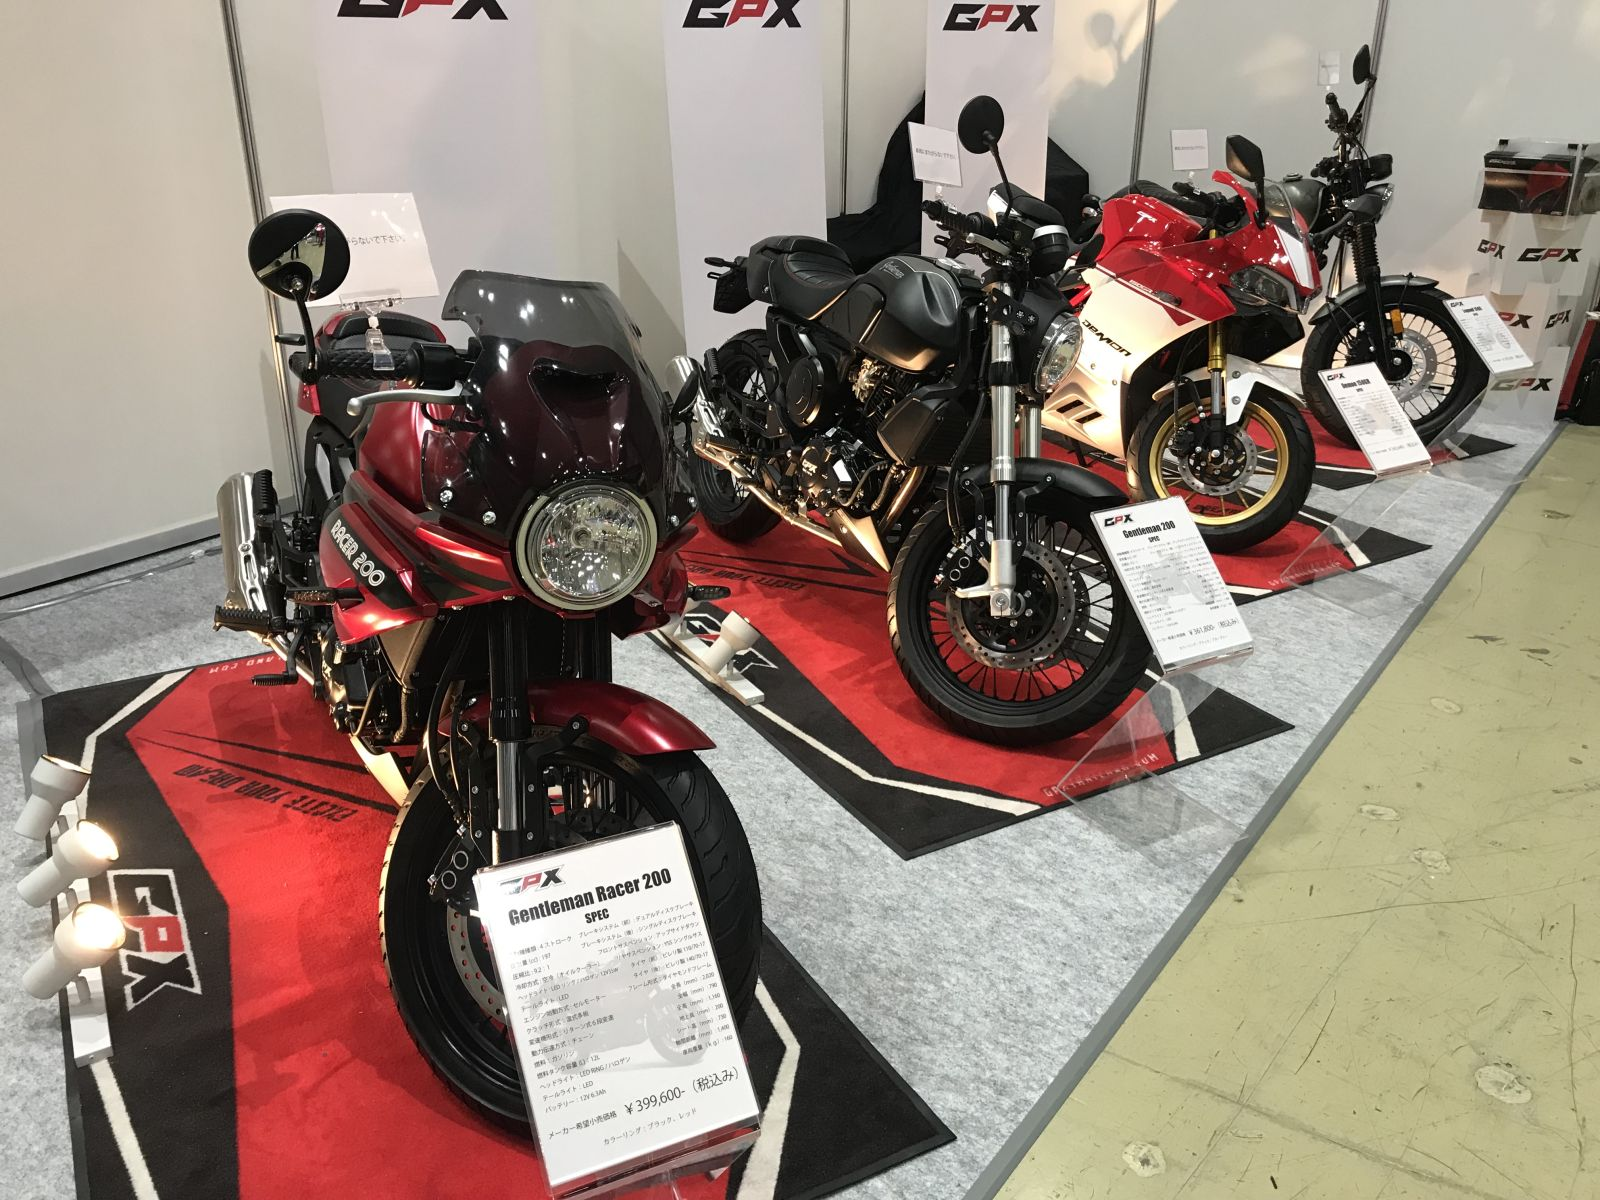 GPX千葉 モーターサイクルショー出展